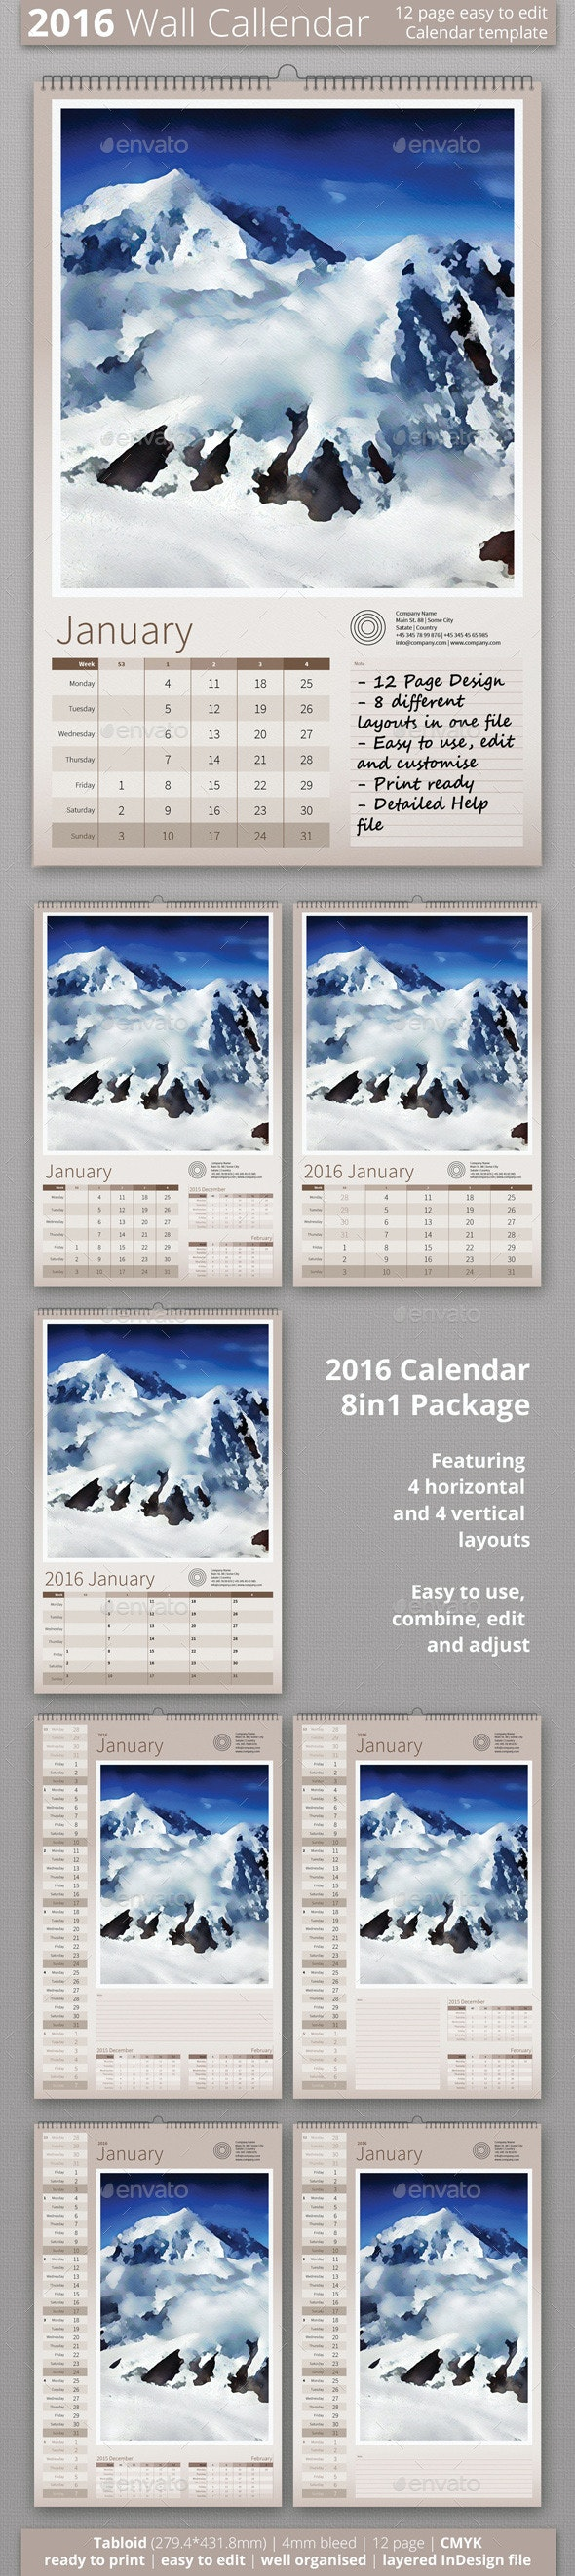 2016 Wall Calendar - Calendars Stationery